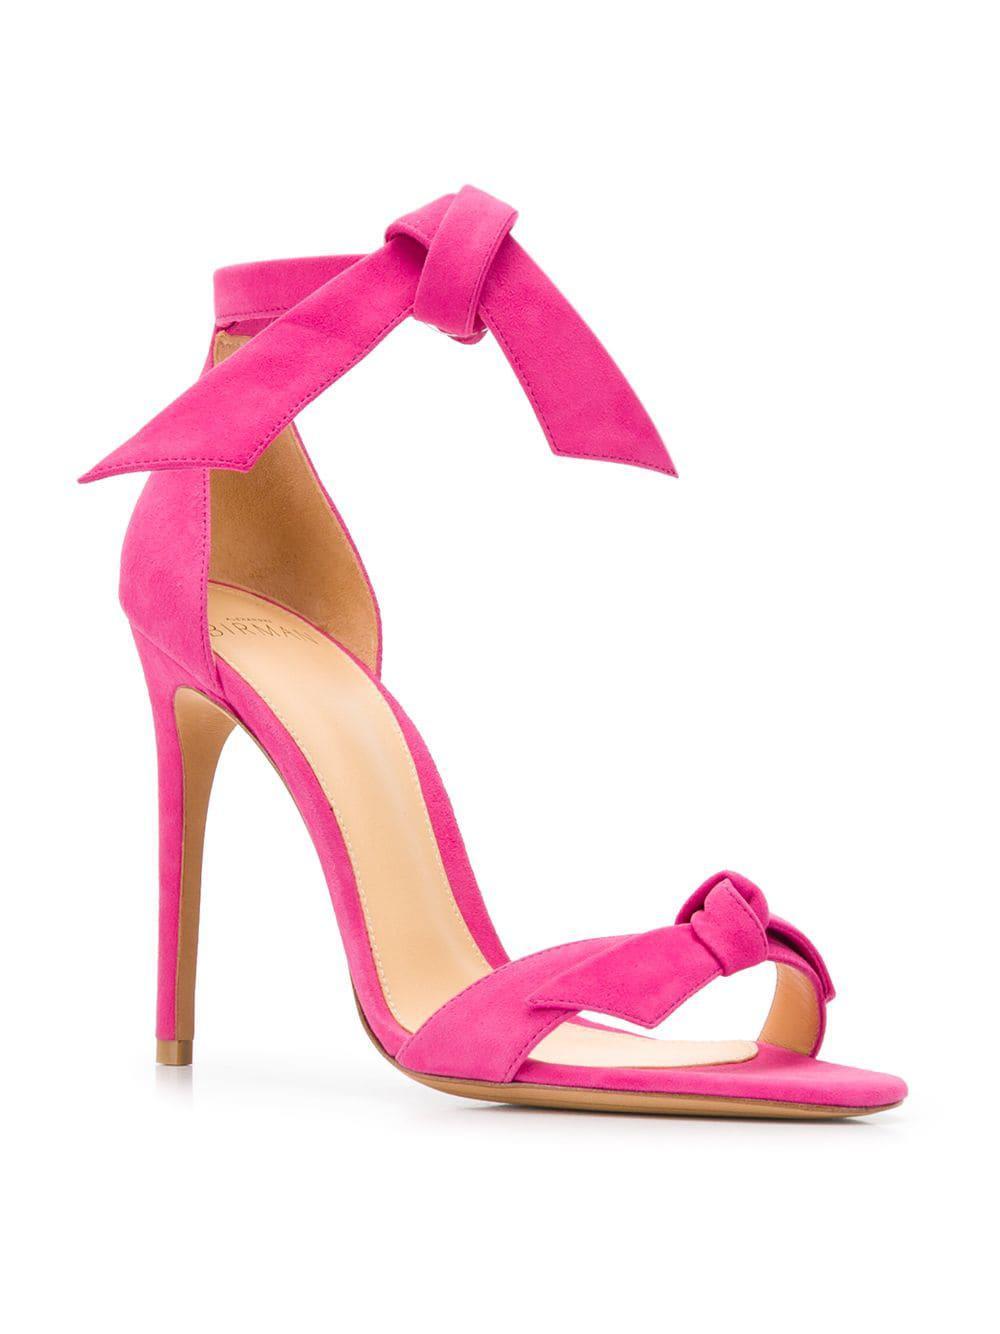 alexandre birman pink sandals